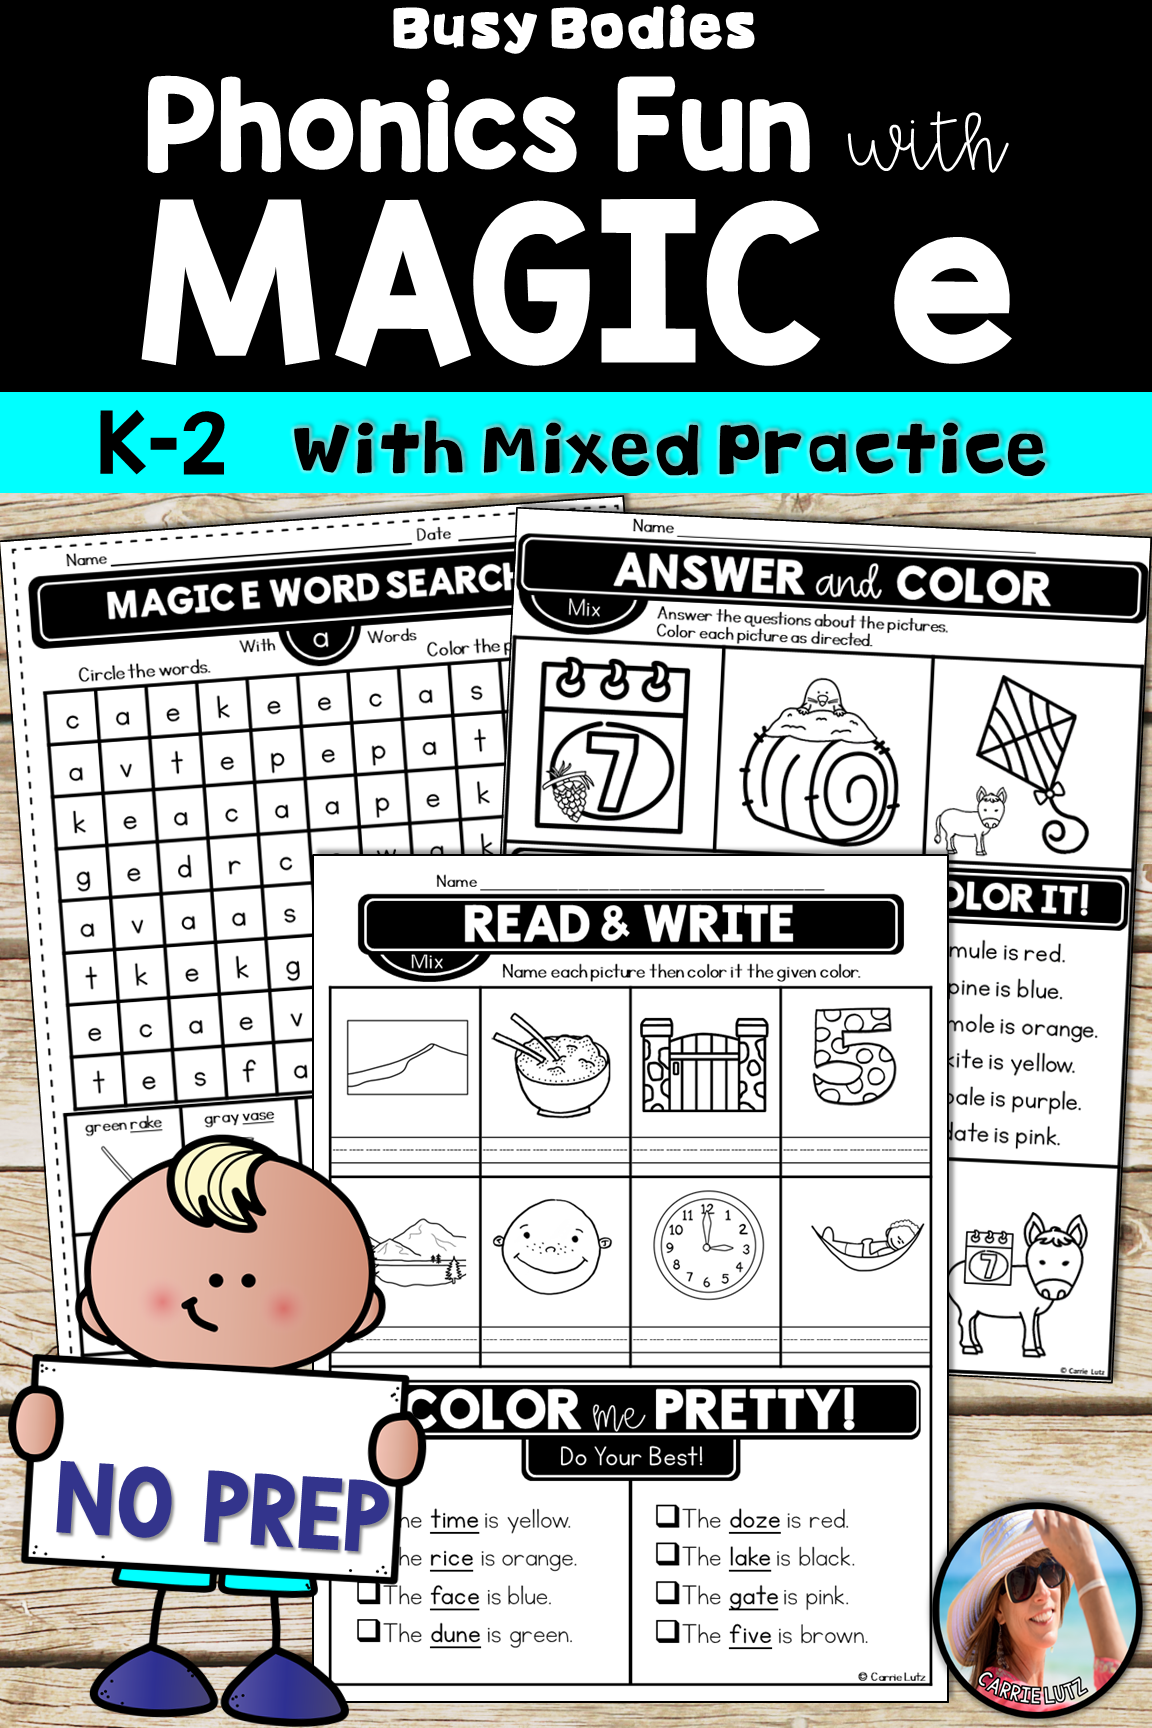 Phonics Magic E Worksheets K-2   Magic e [ 1728 x 1152 Pixel ]